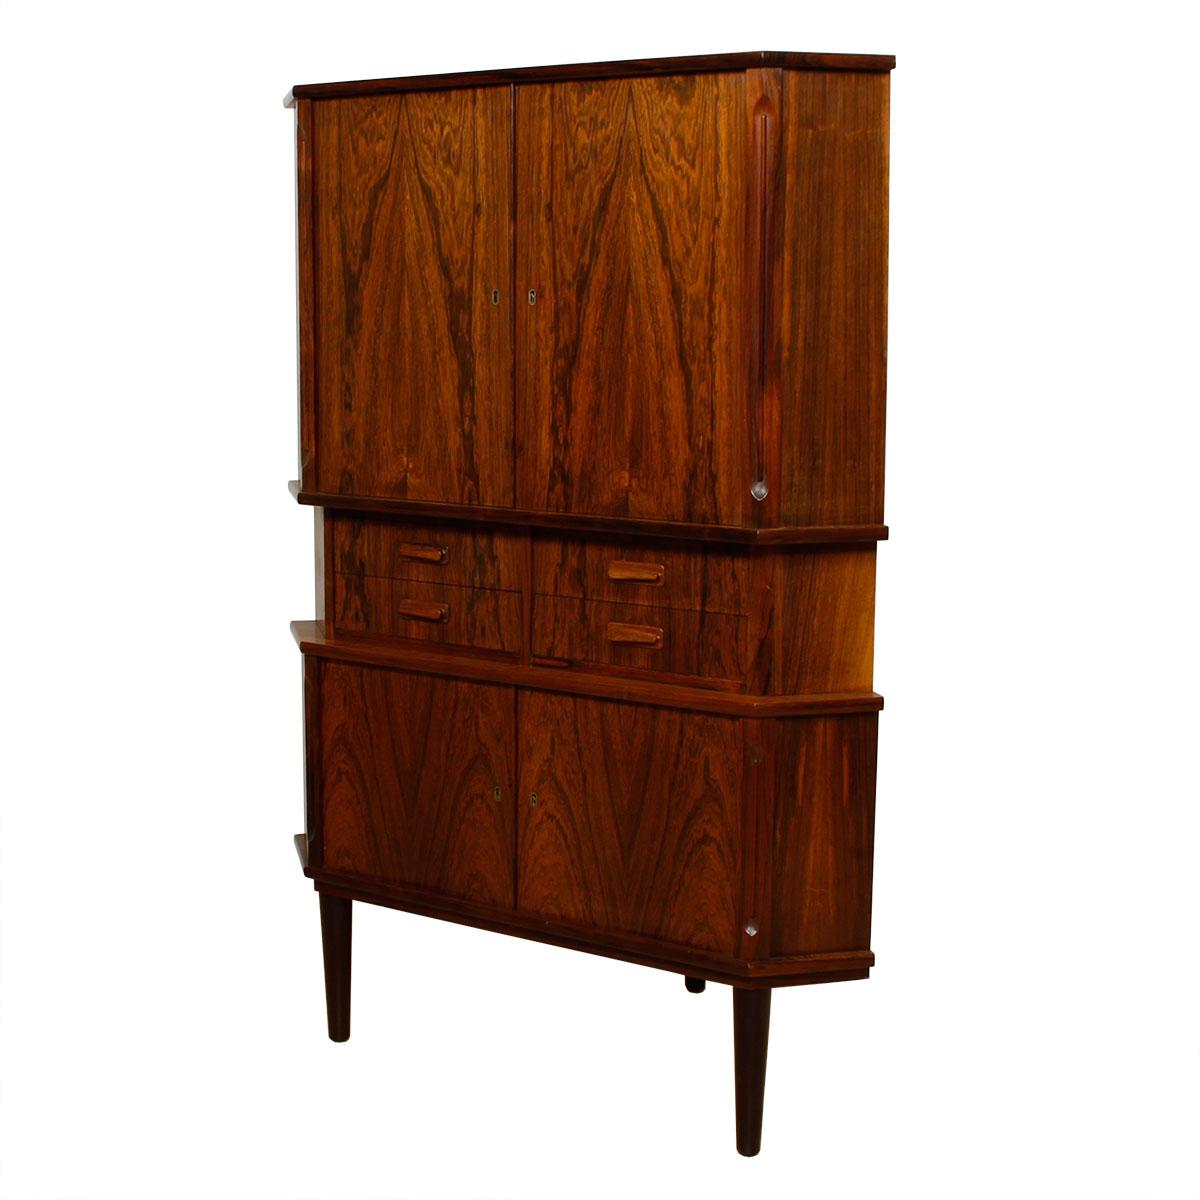 Danish Rosewood Locking Door Corner Bar Cabinet W/ Drawers